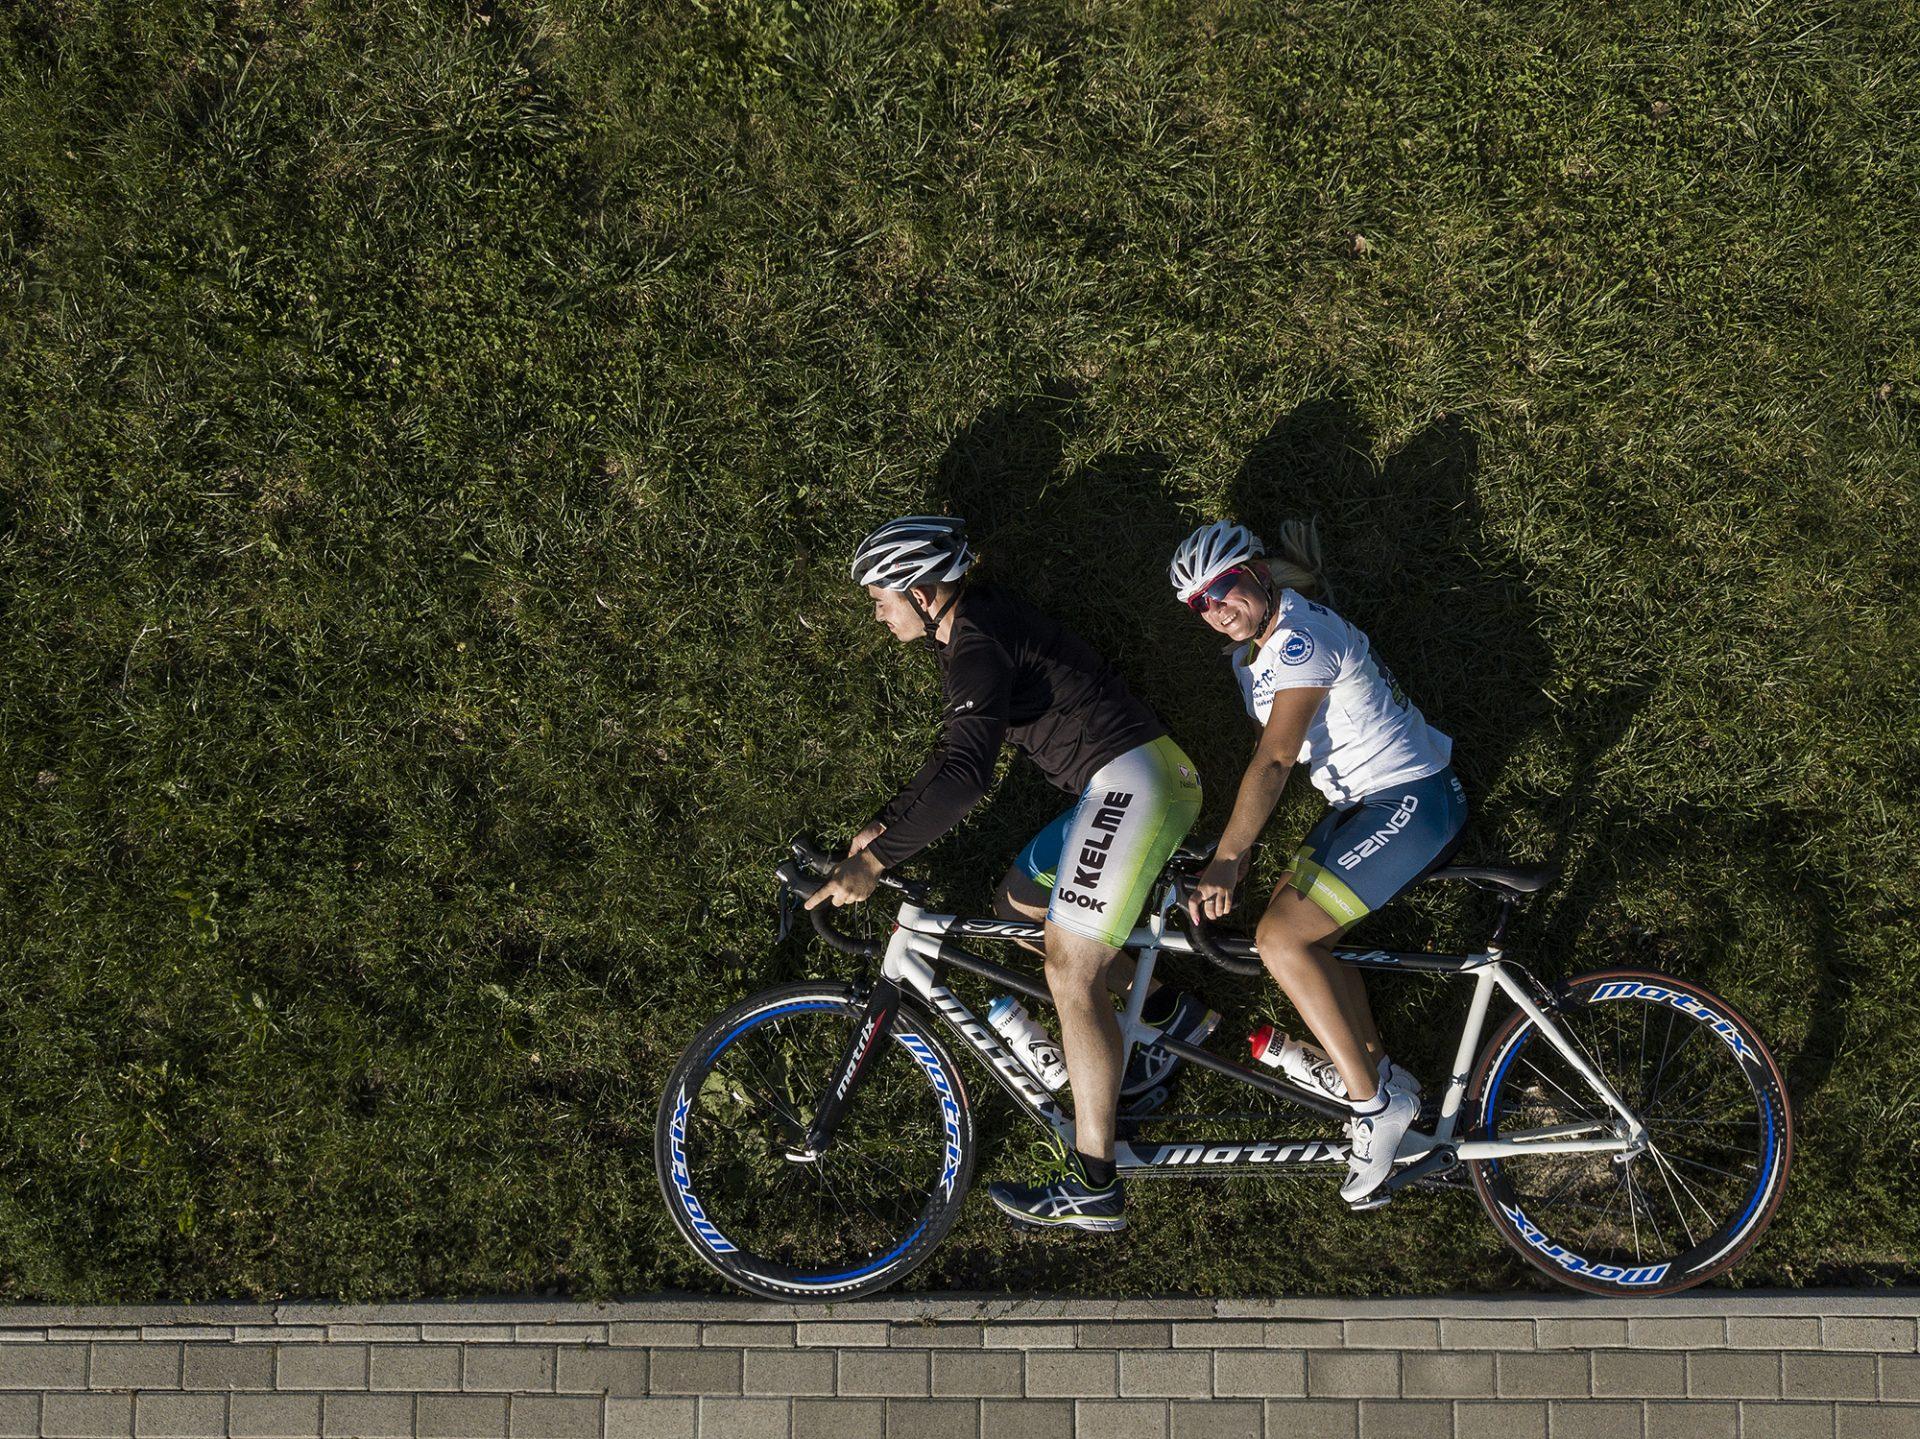 lengyel zsófi we love cycling